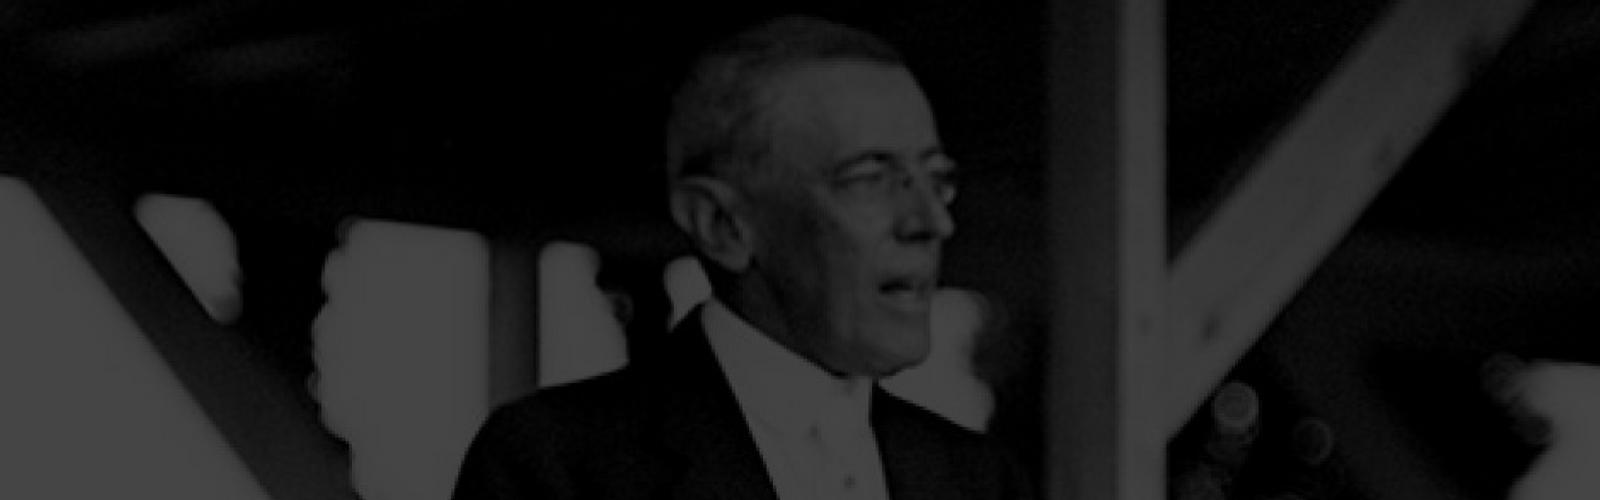 Wilson's First World War Agenda